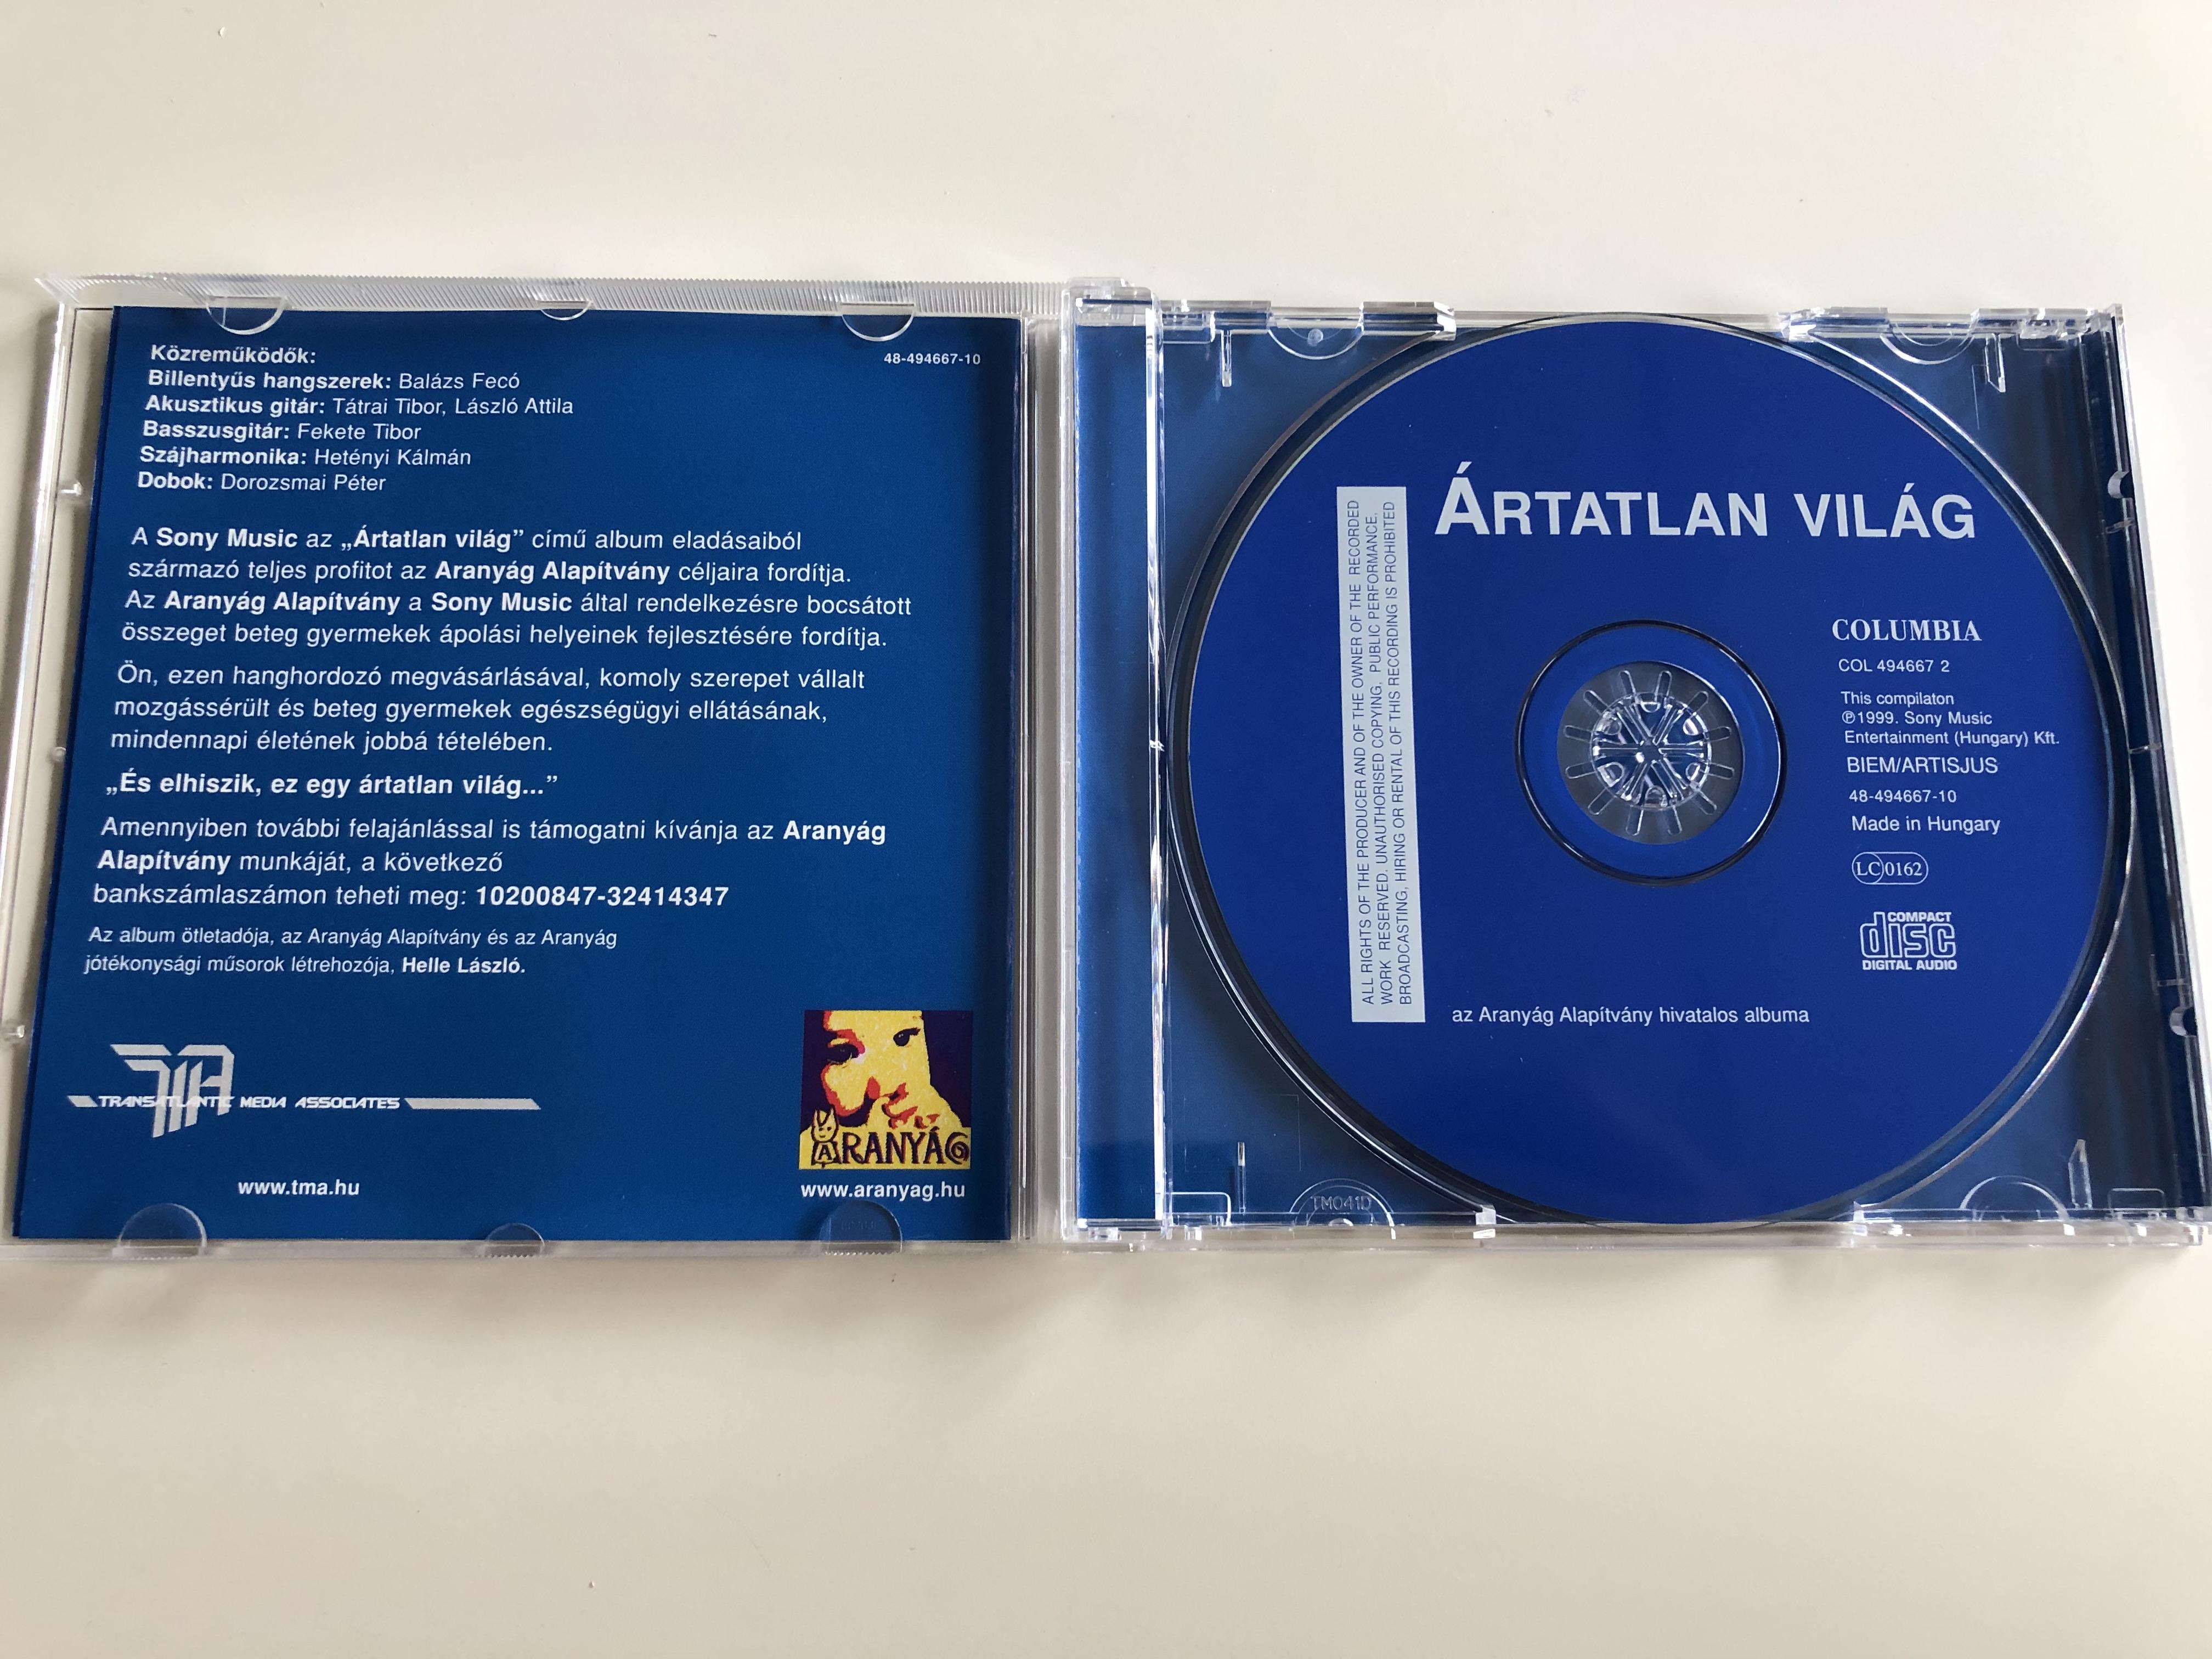 bal-zs-fec-horv-th-attila-rtatlan-vil-g-audio-cd-1999-arany-g-alap-tv-ny-bal-zs-fec-and-friends-auth-csilla-charlie-keresztes-ildik-kimnowak-orsi-roy-d-m-soml-tam-s-unisex-bon-bon-t-trai-band-vikid-7209061-.jpg